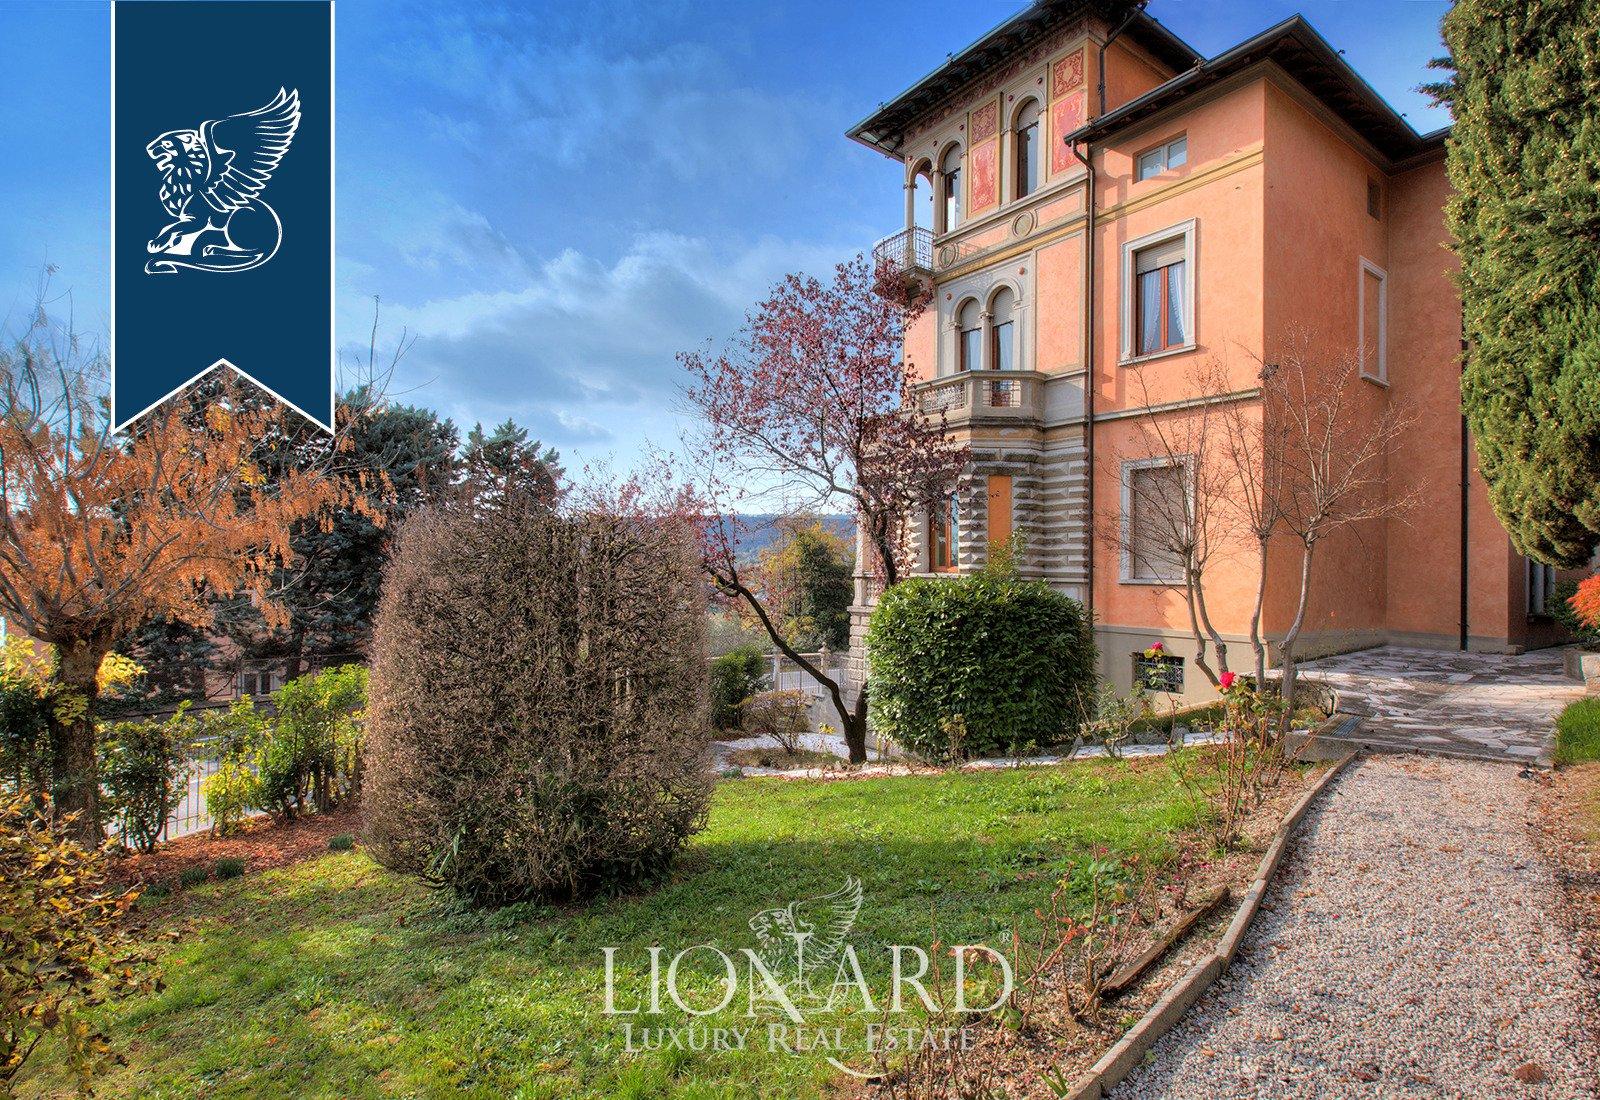 Villa in Salò, Lombardy, Italy 1